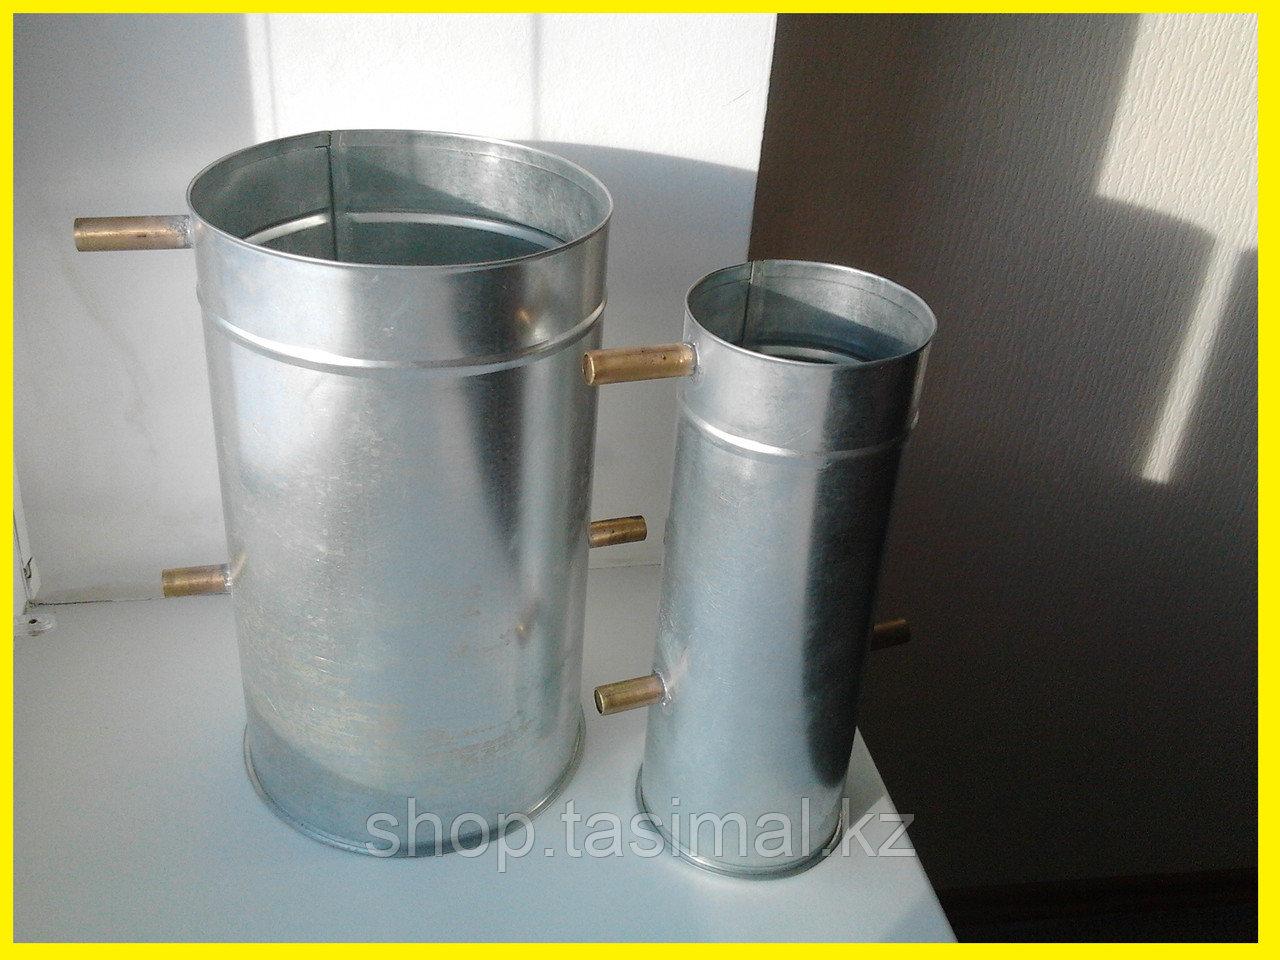 КП-305 - Сосуд для отмучивания щебня